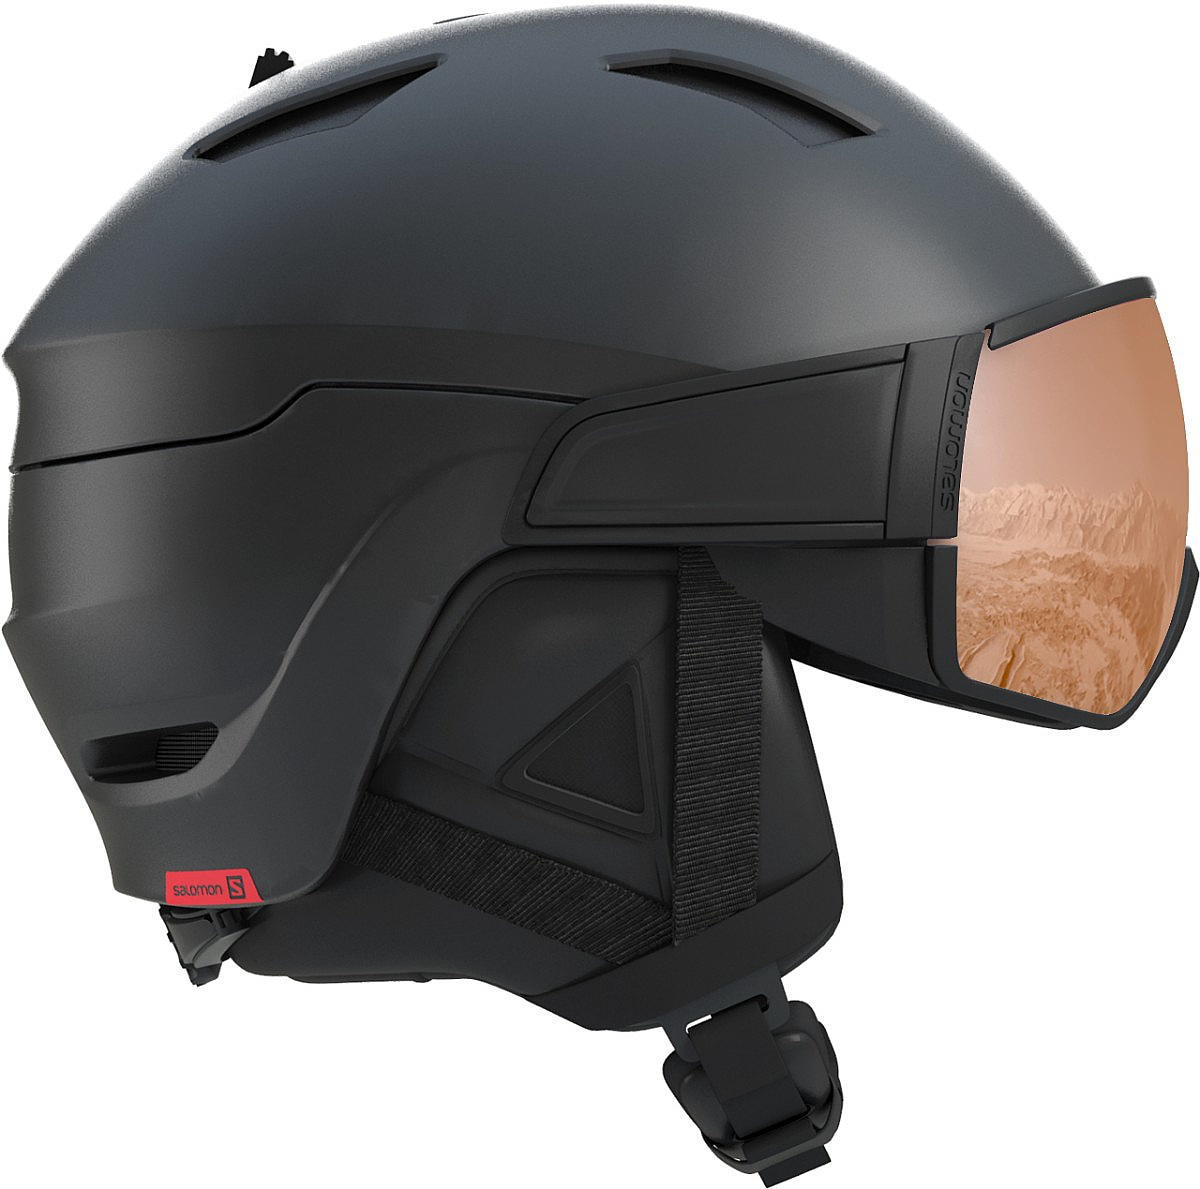 helma Salomon Driver S - Black/Red Accent/Univrsal M